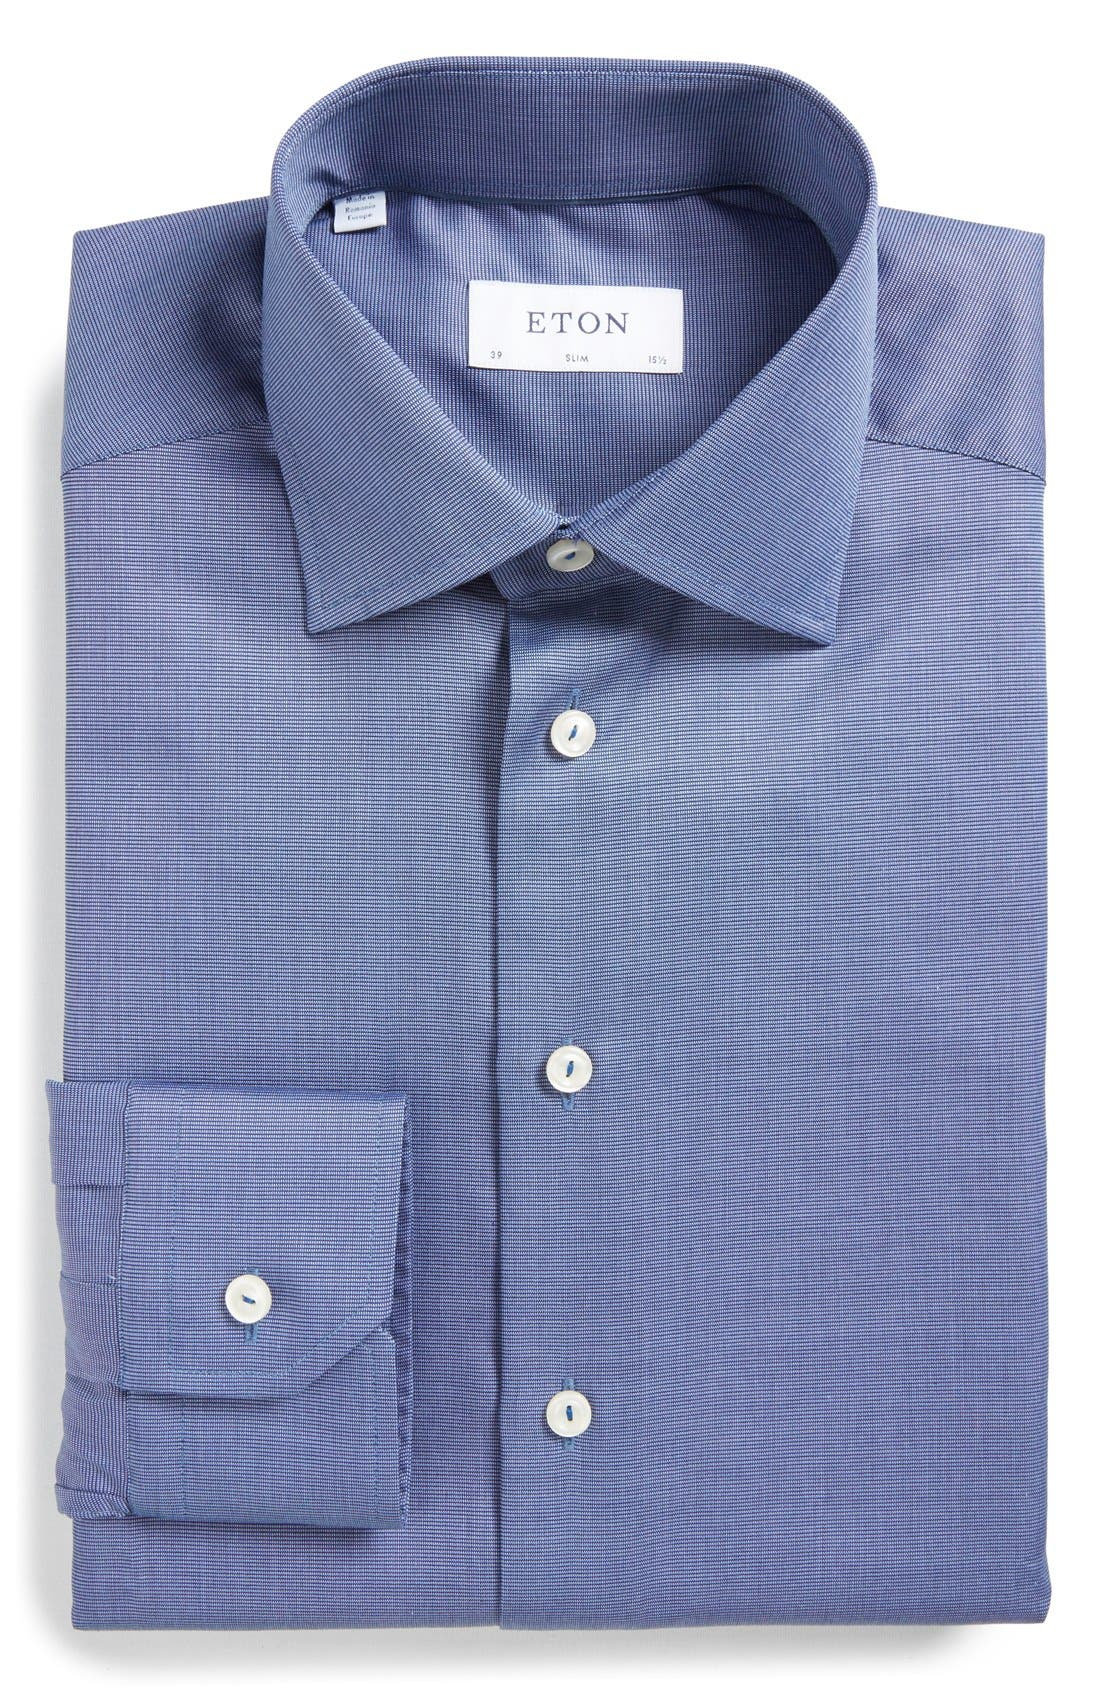 Alternate Image 1 Selected - Eton Slim Fit Solid Dress Shirt